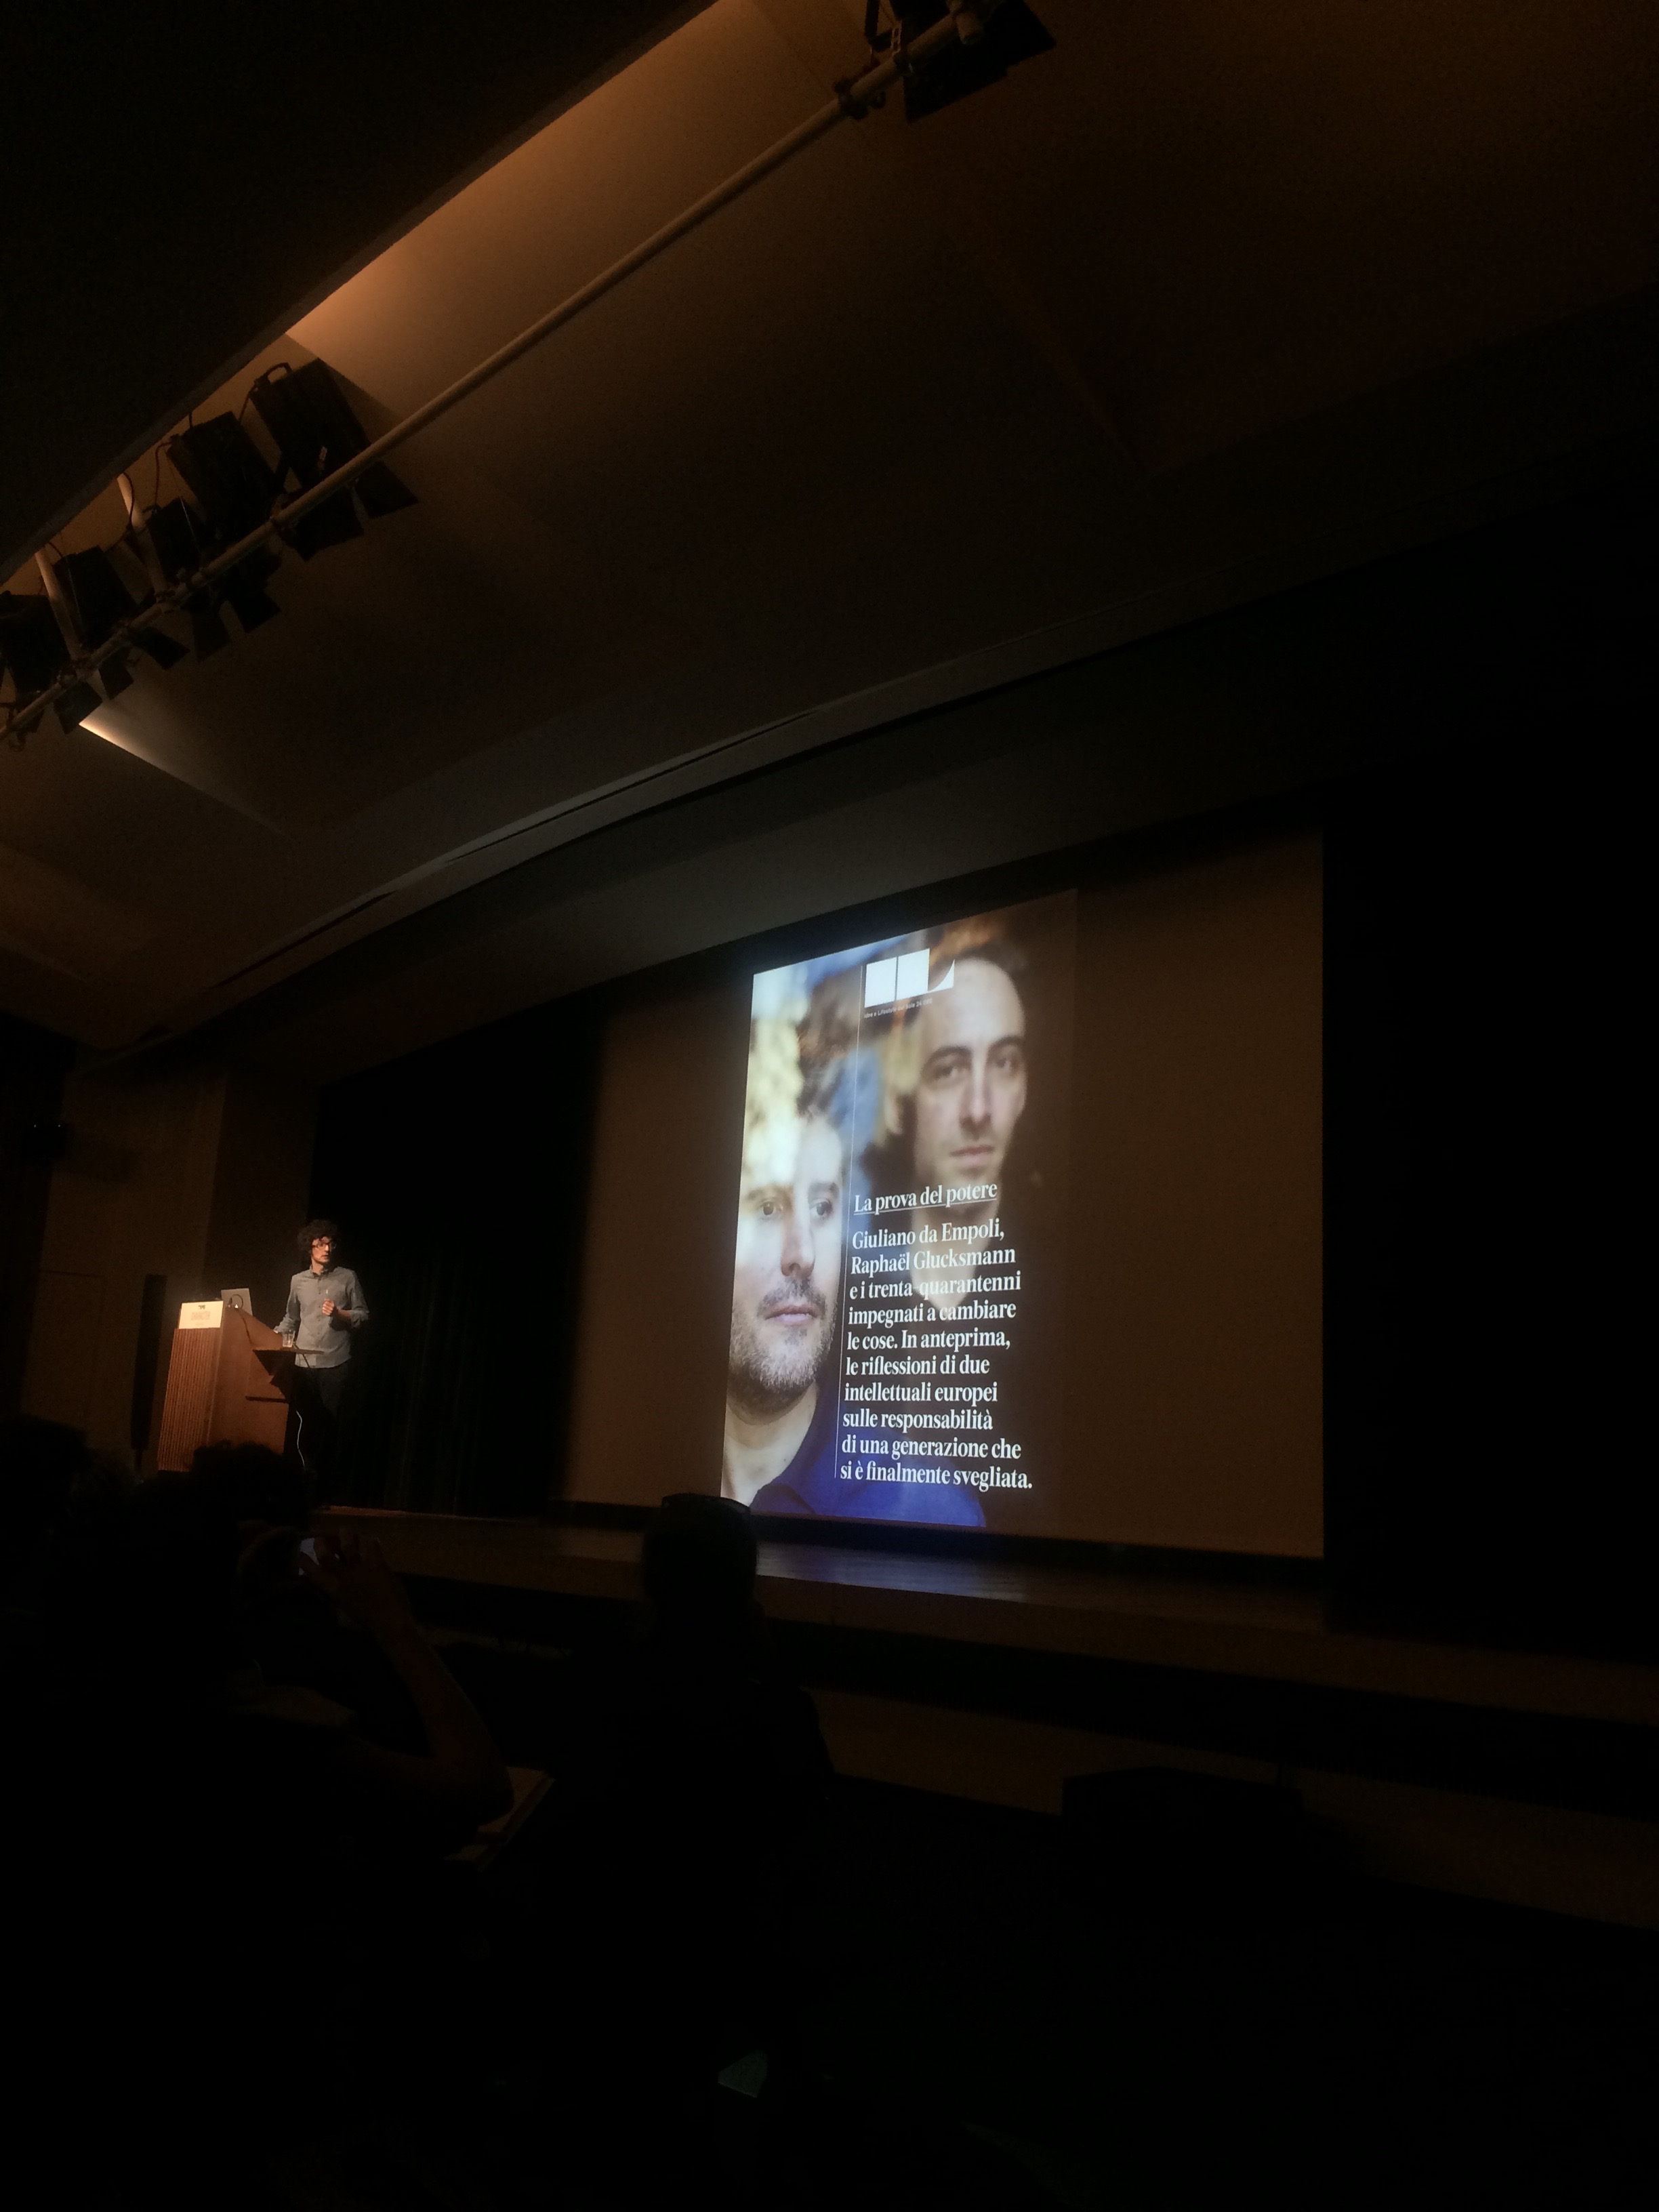 Francesco Franchi: Strukturiert informiert